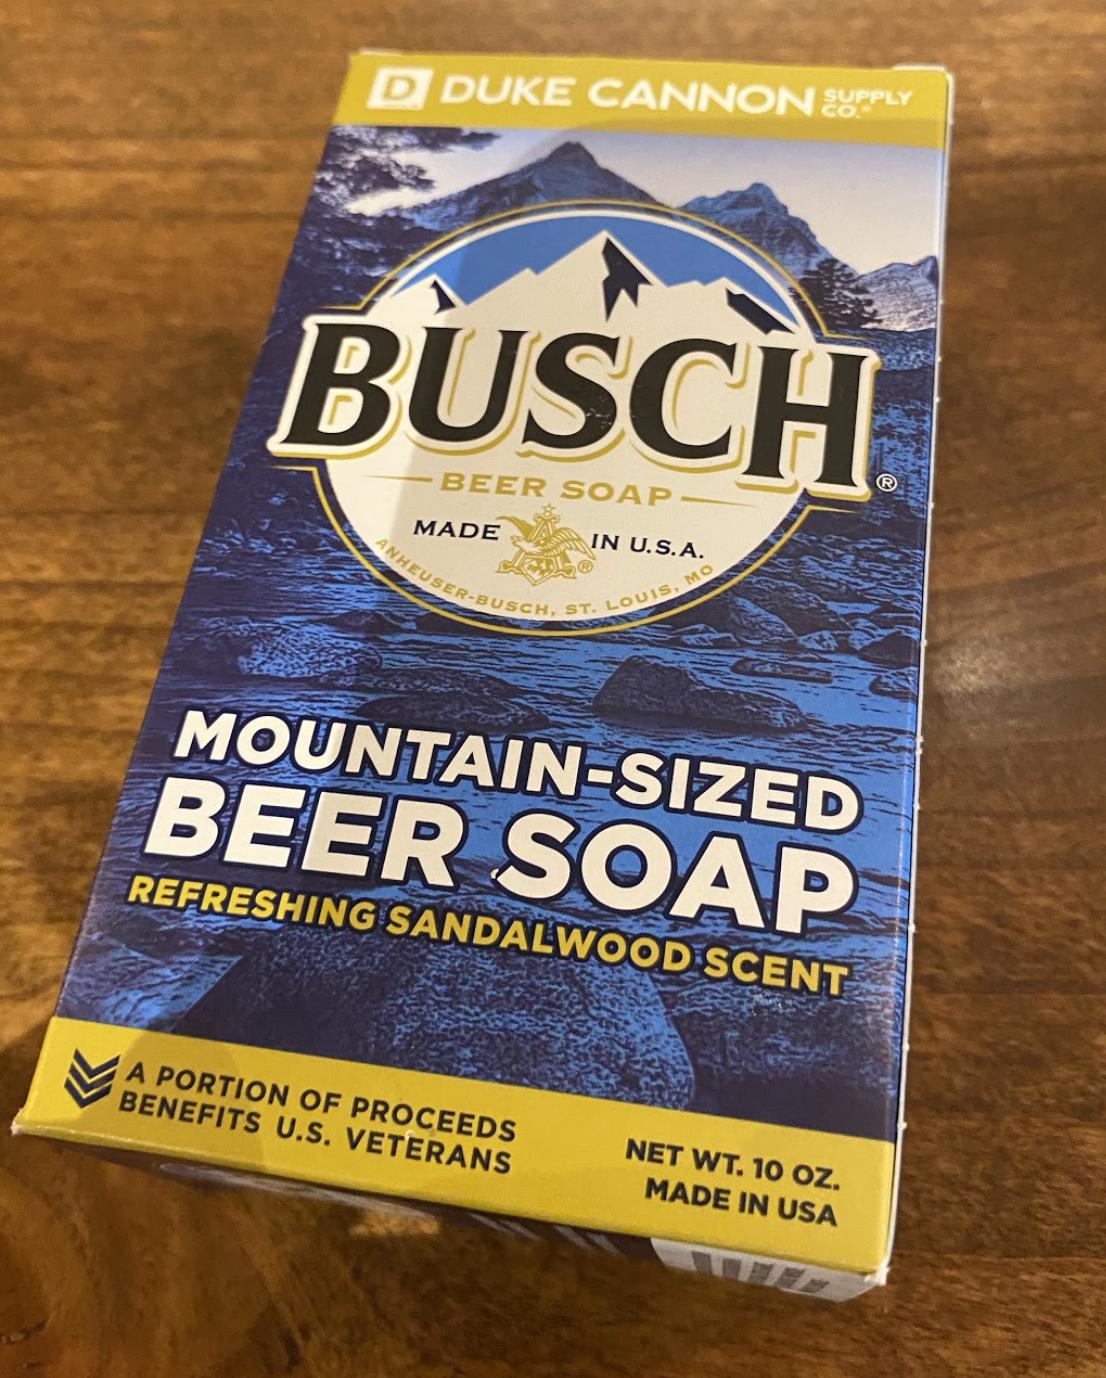 Busch Beer Soap